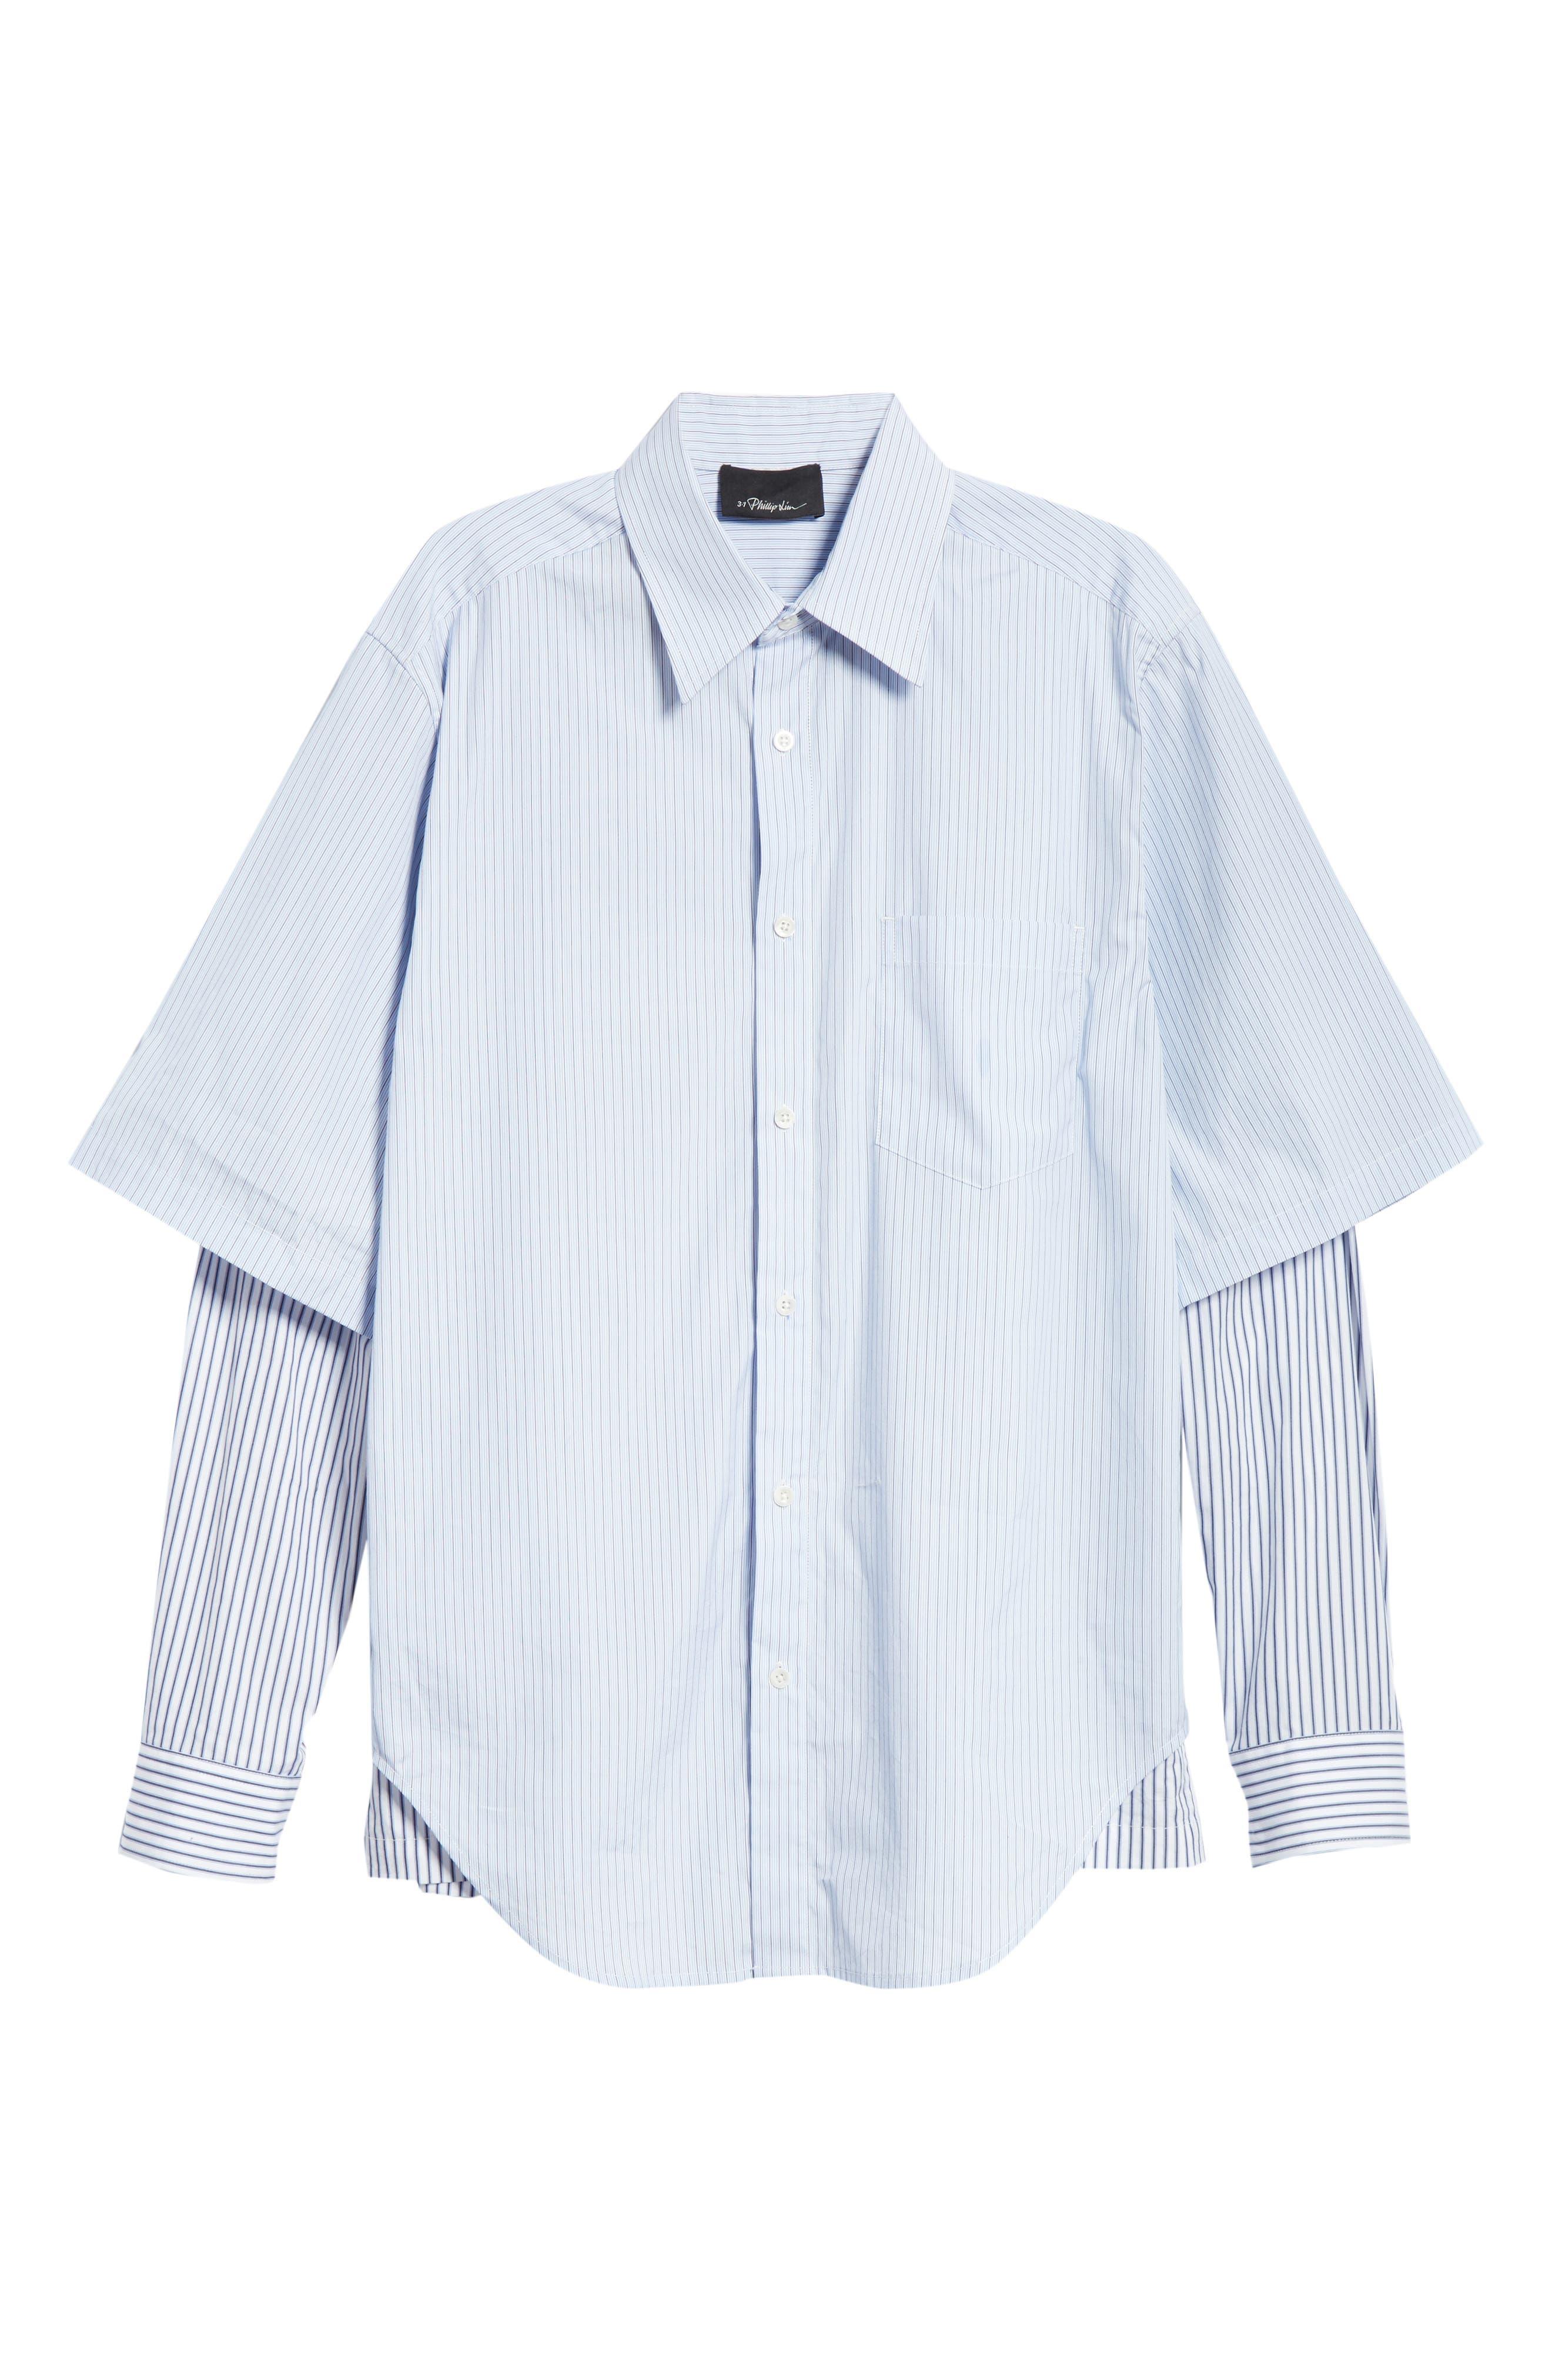 Double Layer Woven Shirt,                             Alternate thumbnail 6, color,                             WHITE